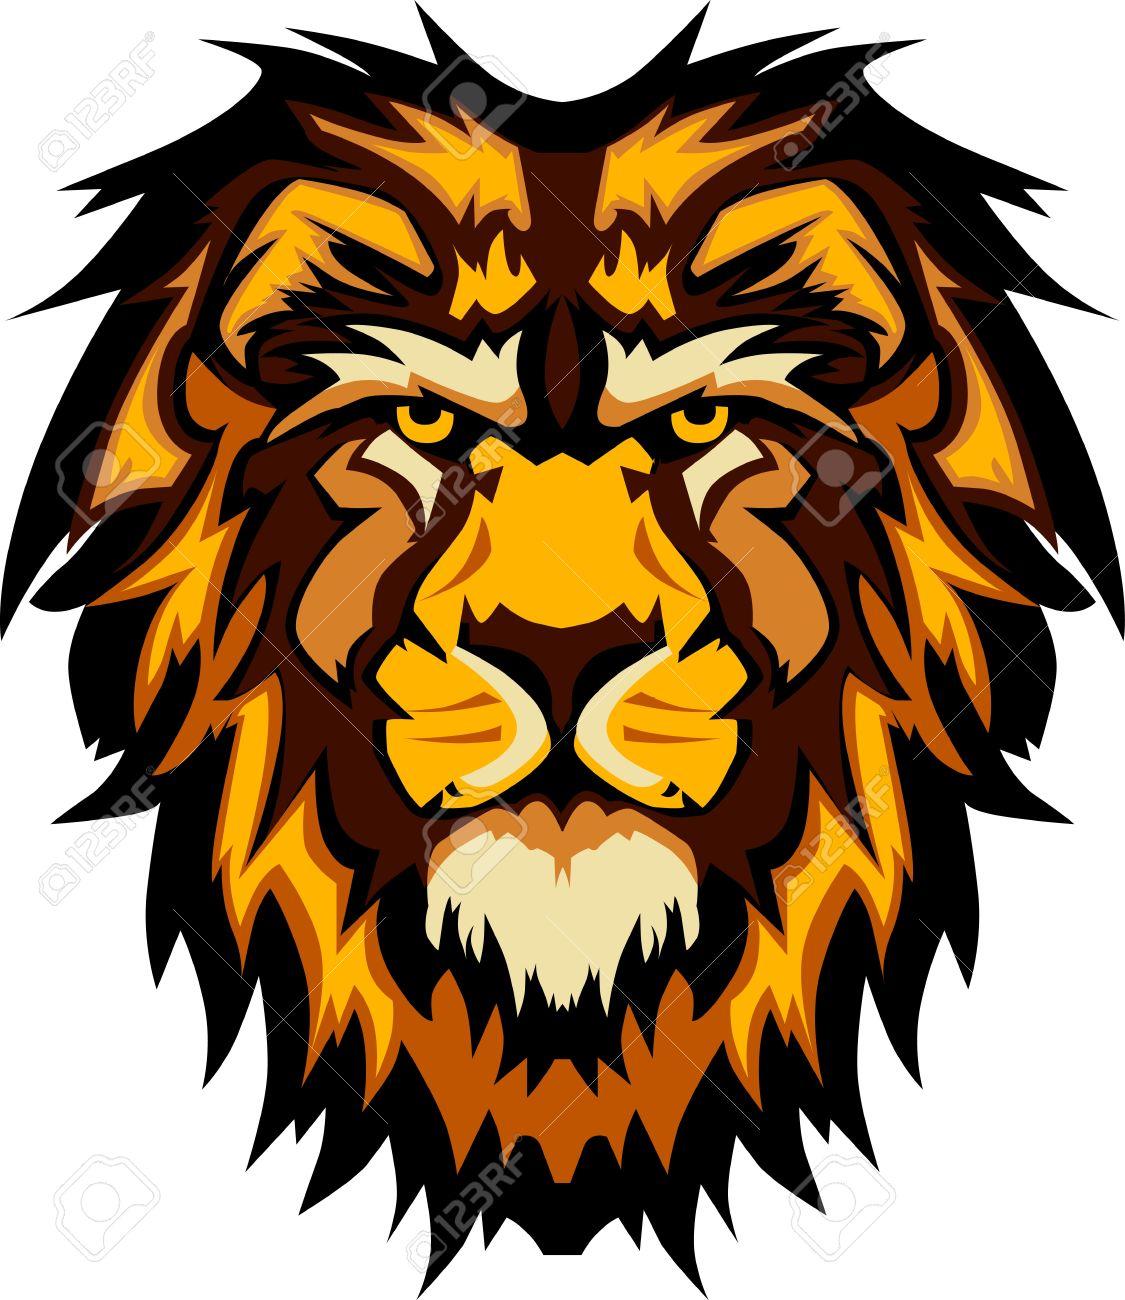 lion head graphic mascot logo royalty free cliparts vectors and rh 123rf com Lion Logos as Mascots Lion Mascot Logo